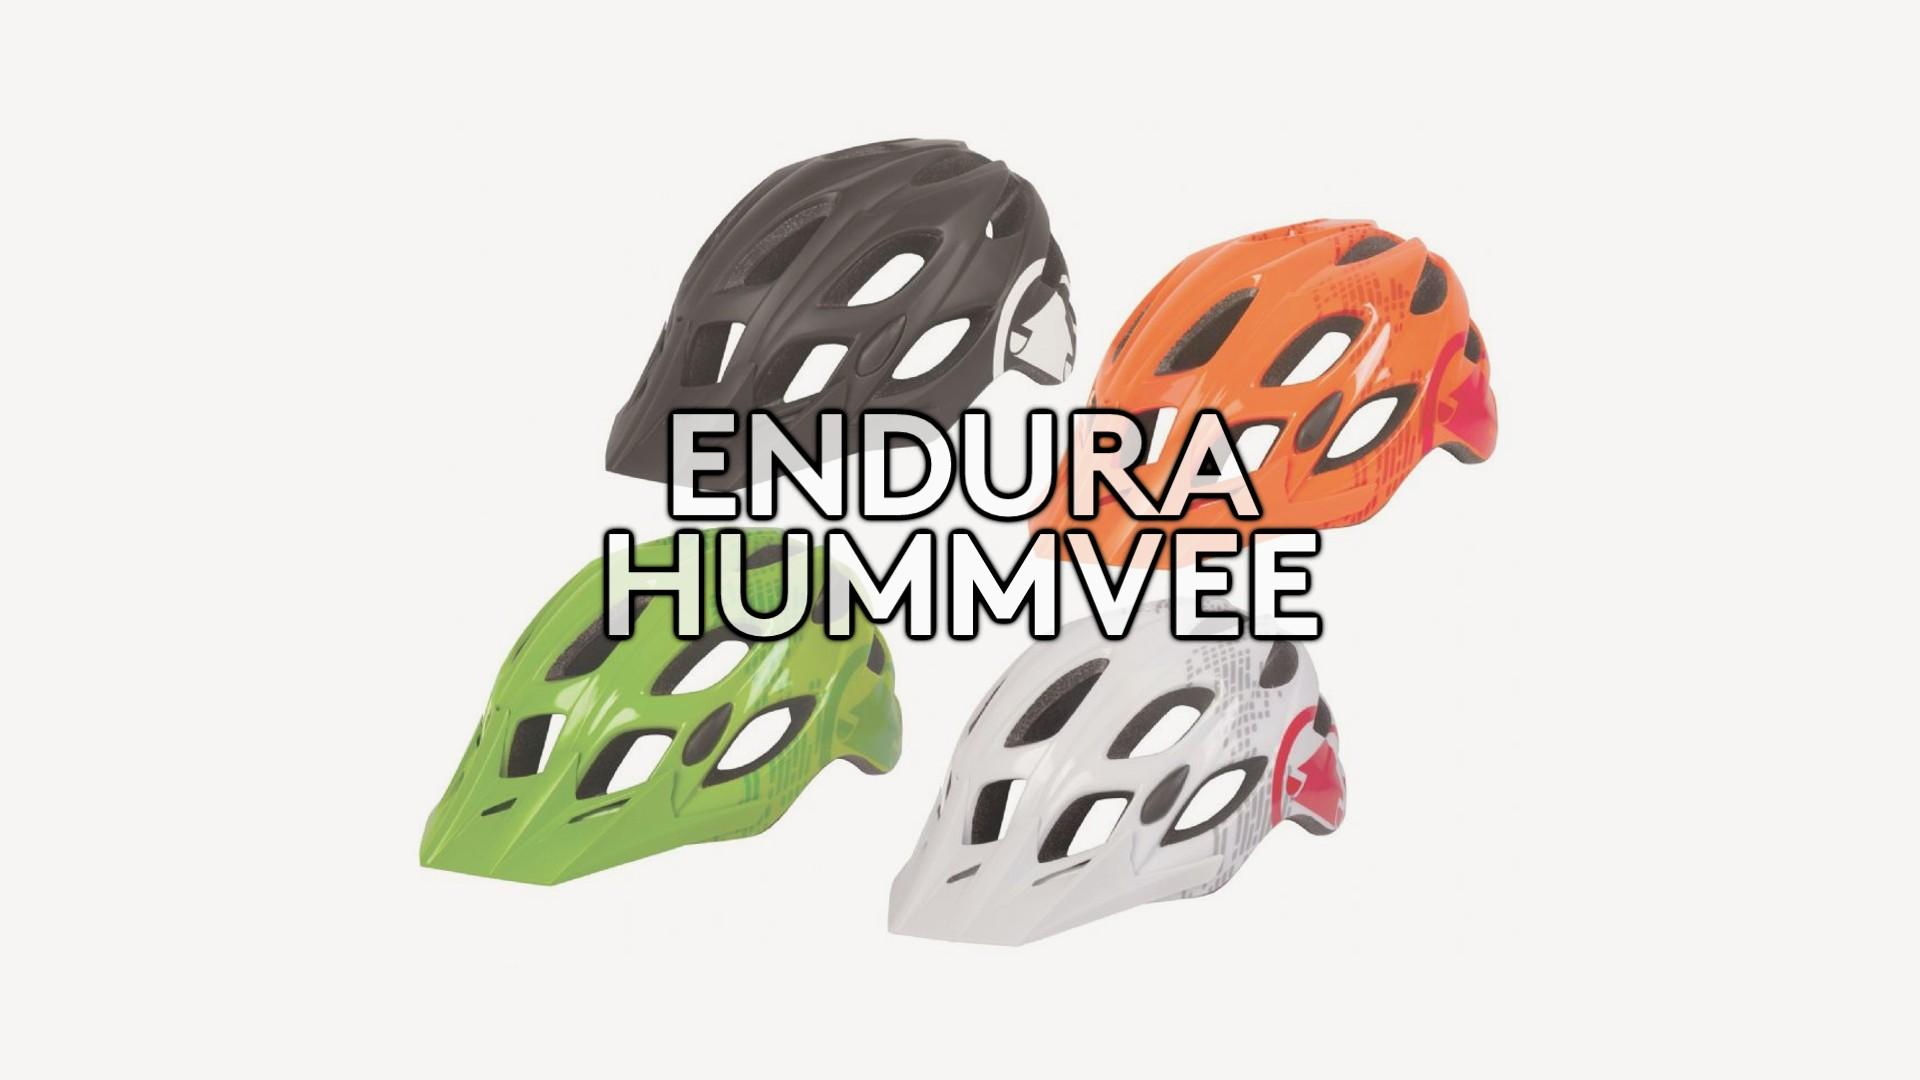 Kask Endura Hummvee